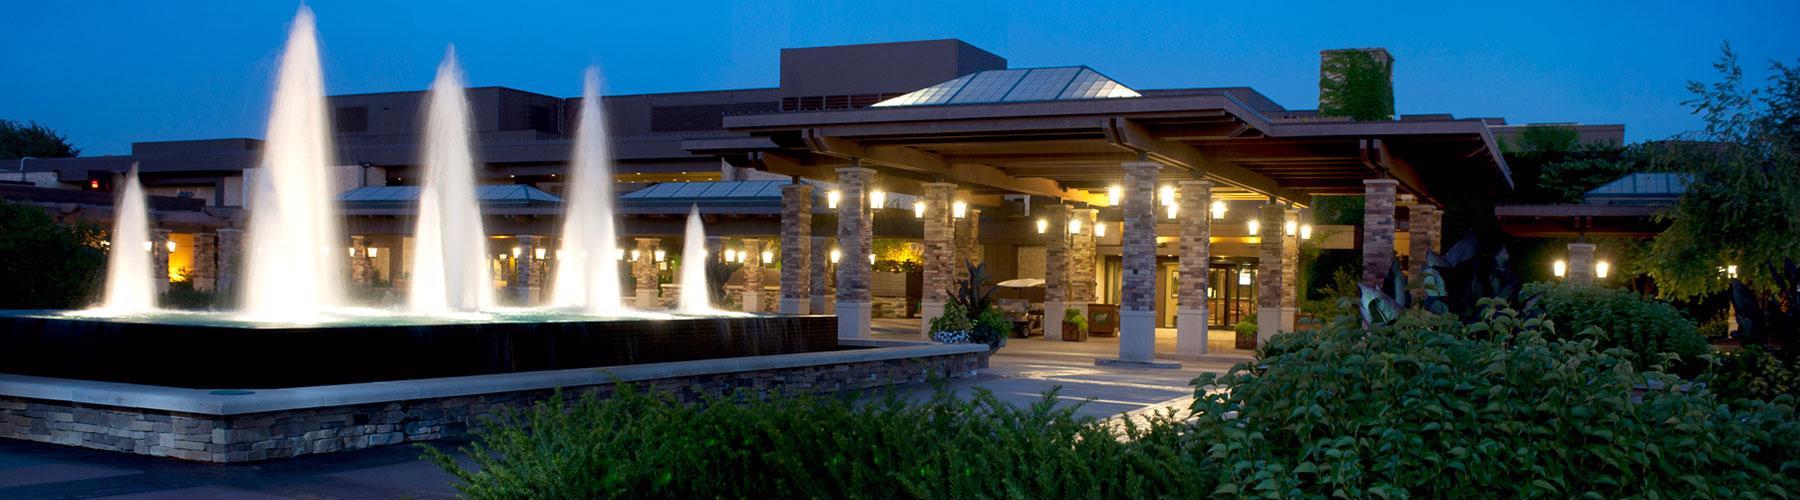 Limo Service to Grand Geneva Resort & Spa Lake Geneva Luxury Resort Wisconsin